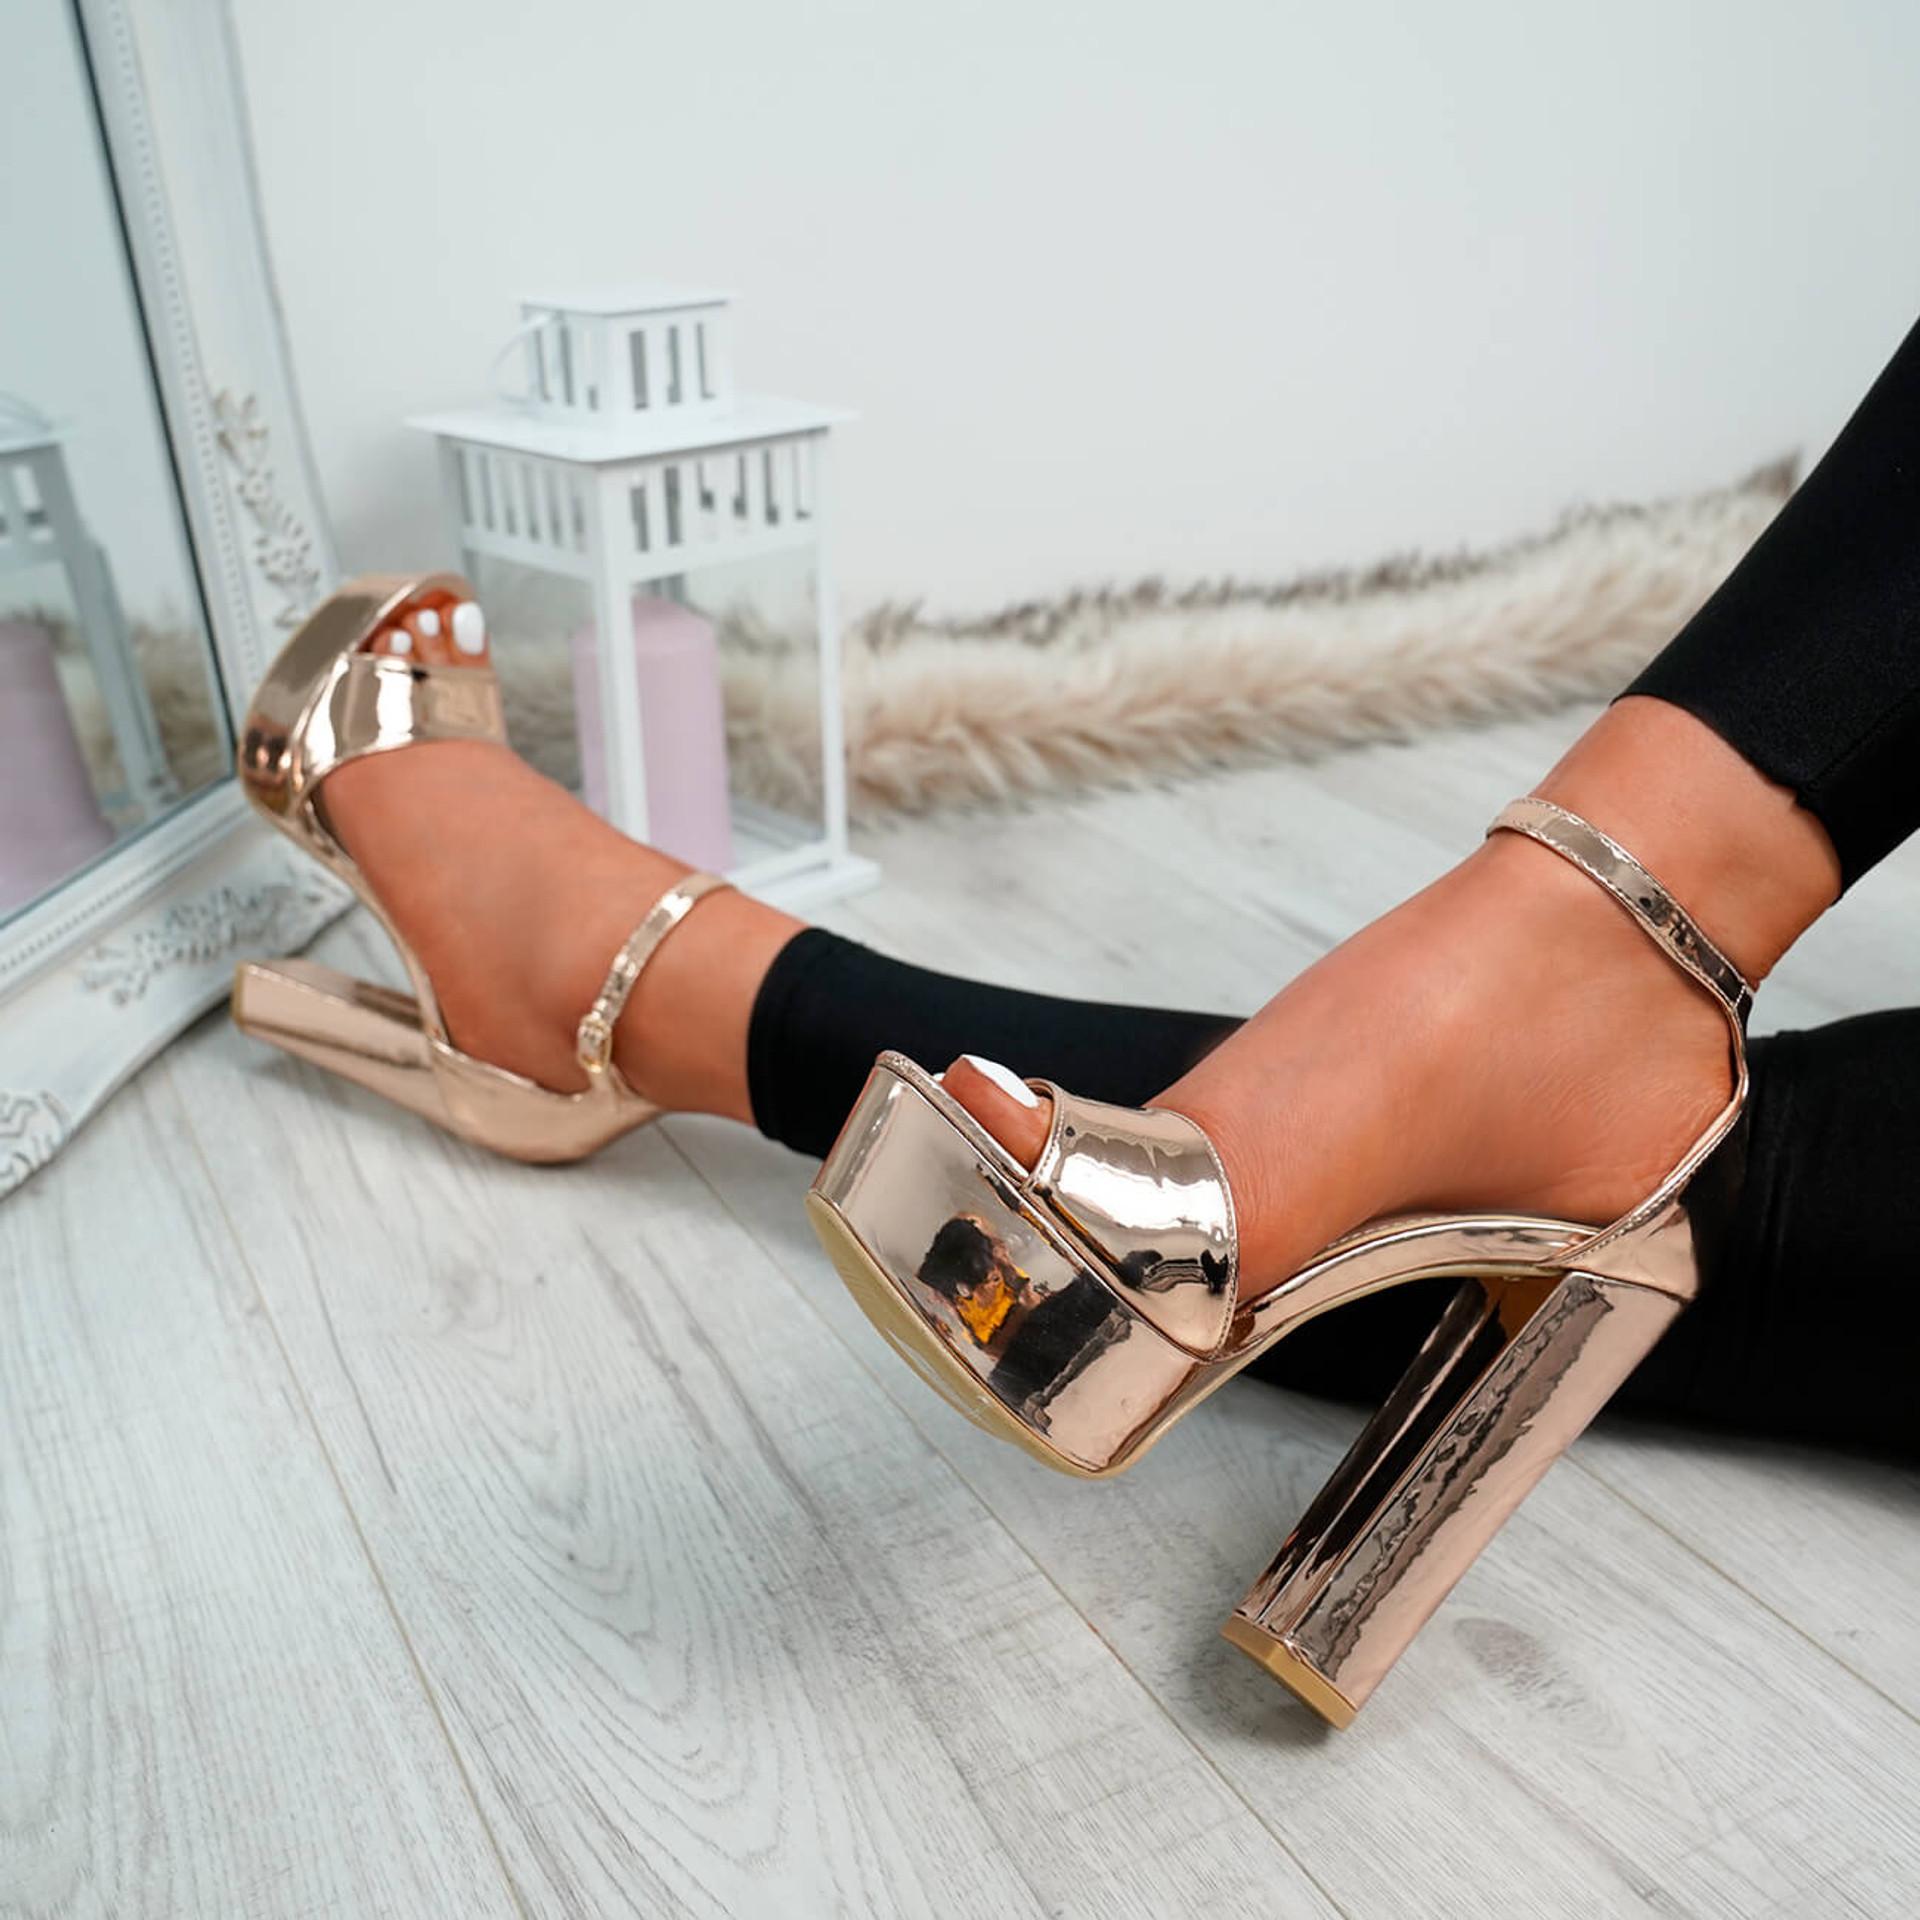 Avery Champagne Block Heel Platforms